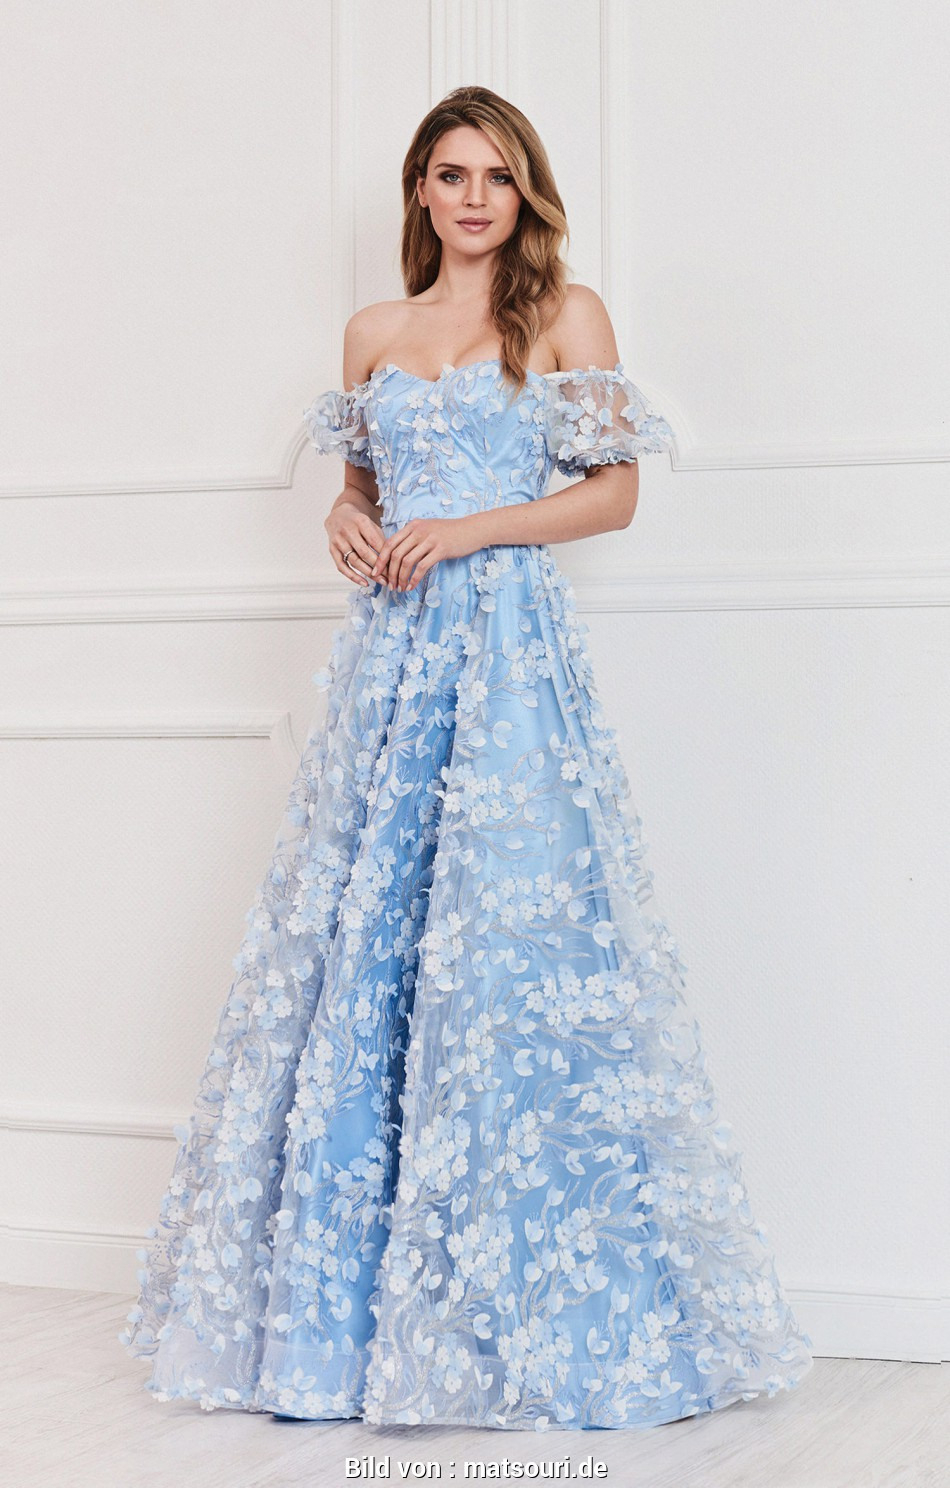 17 Cool Abendkleider Neukölln Spezialgebiet13 Ausgezeichnet Abendkleider Neukölln Spezialgebiet